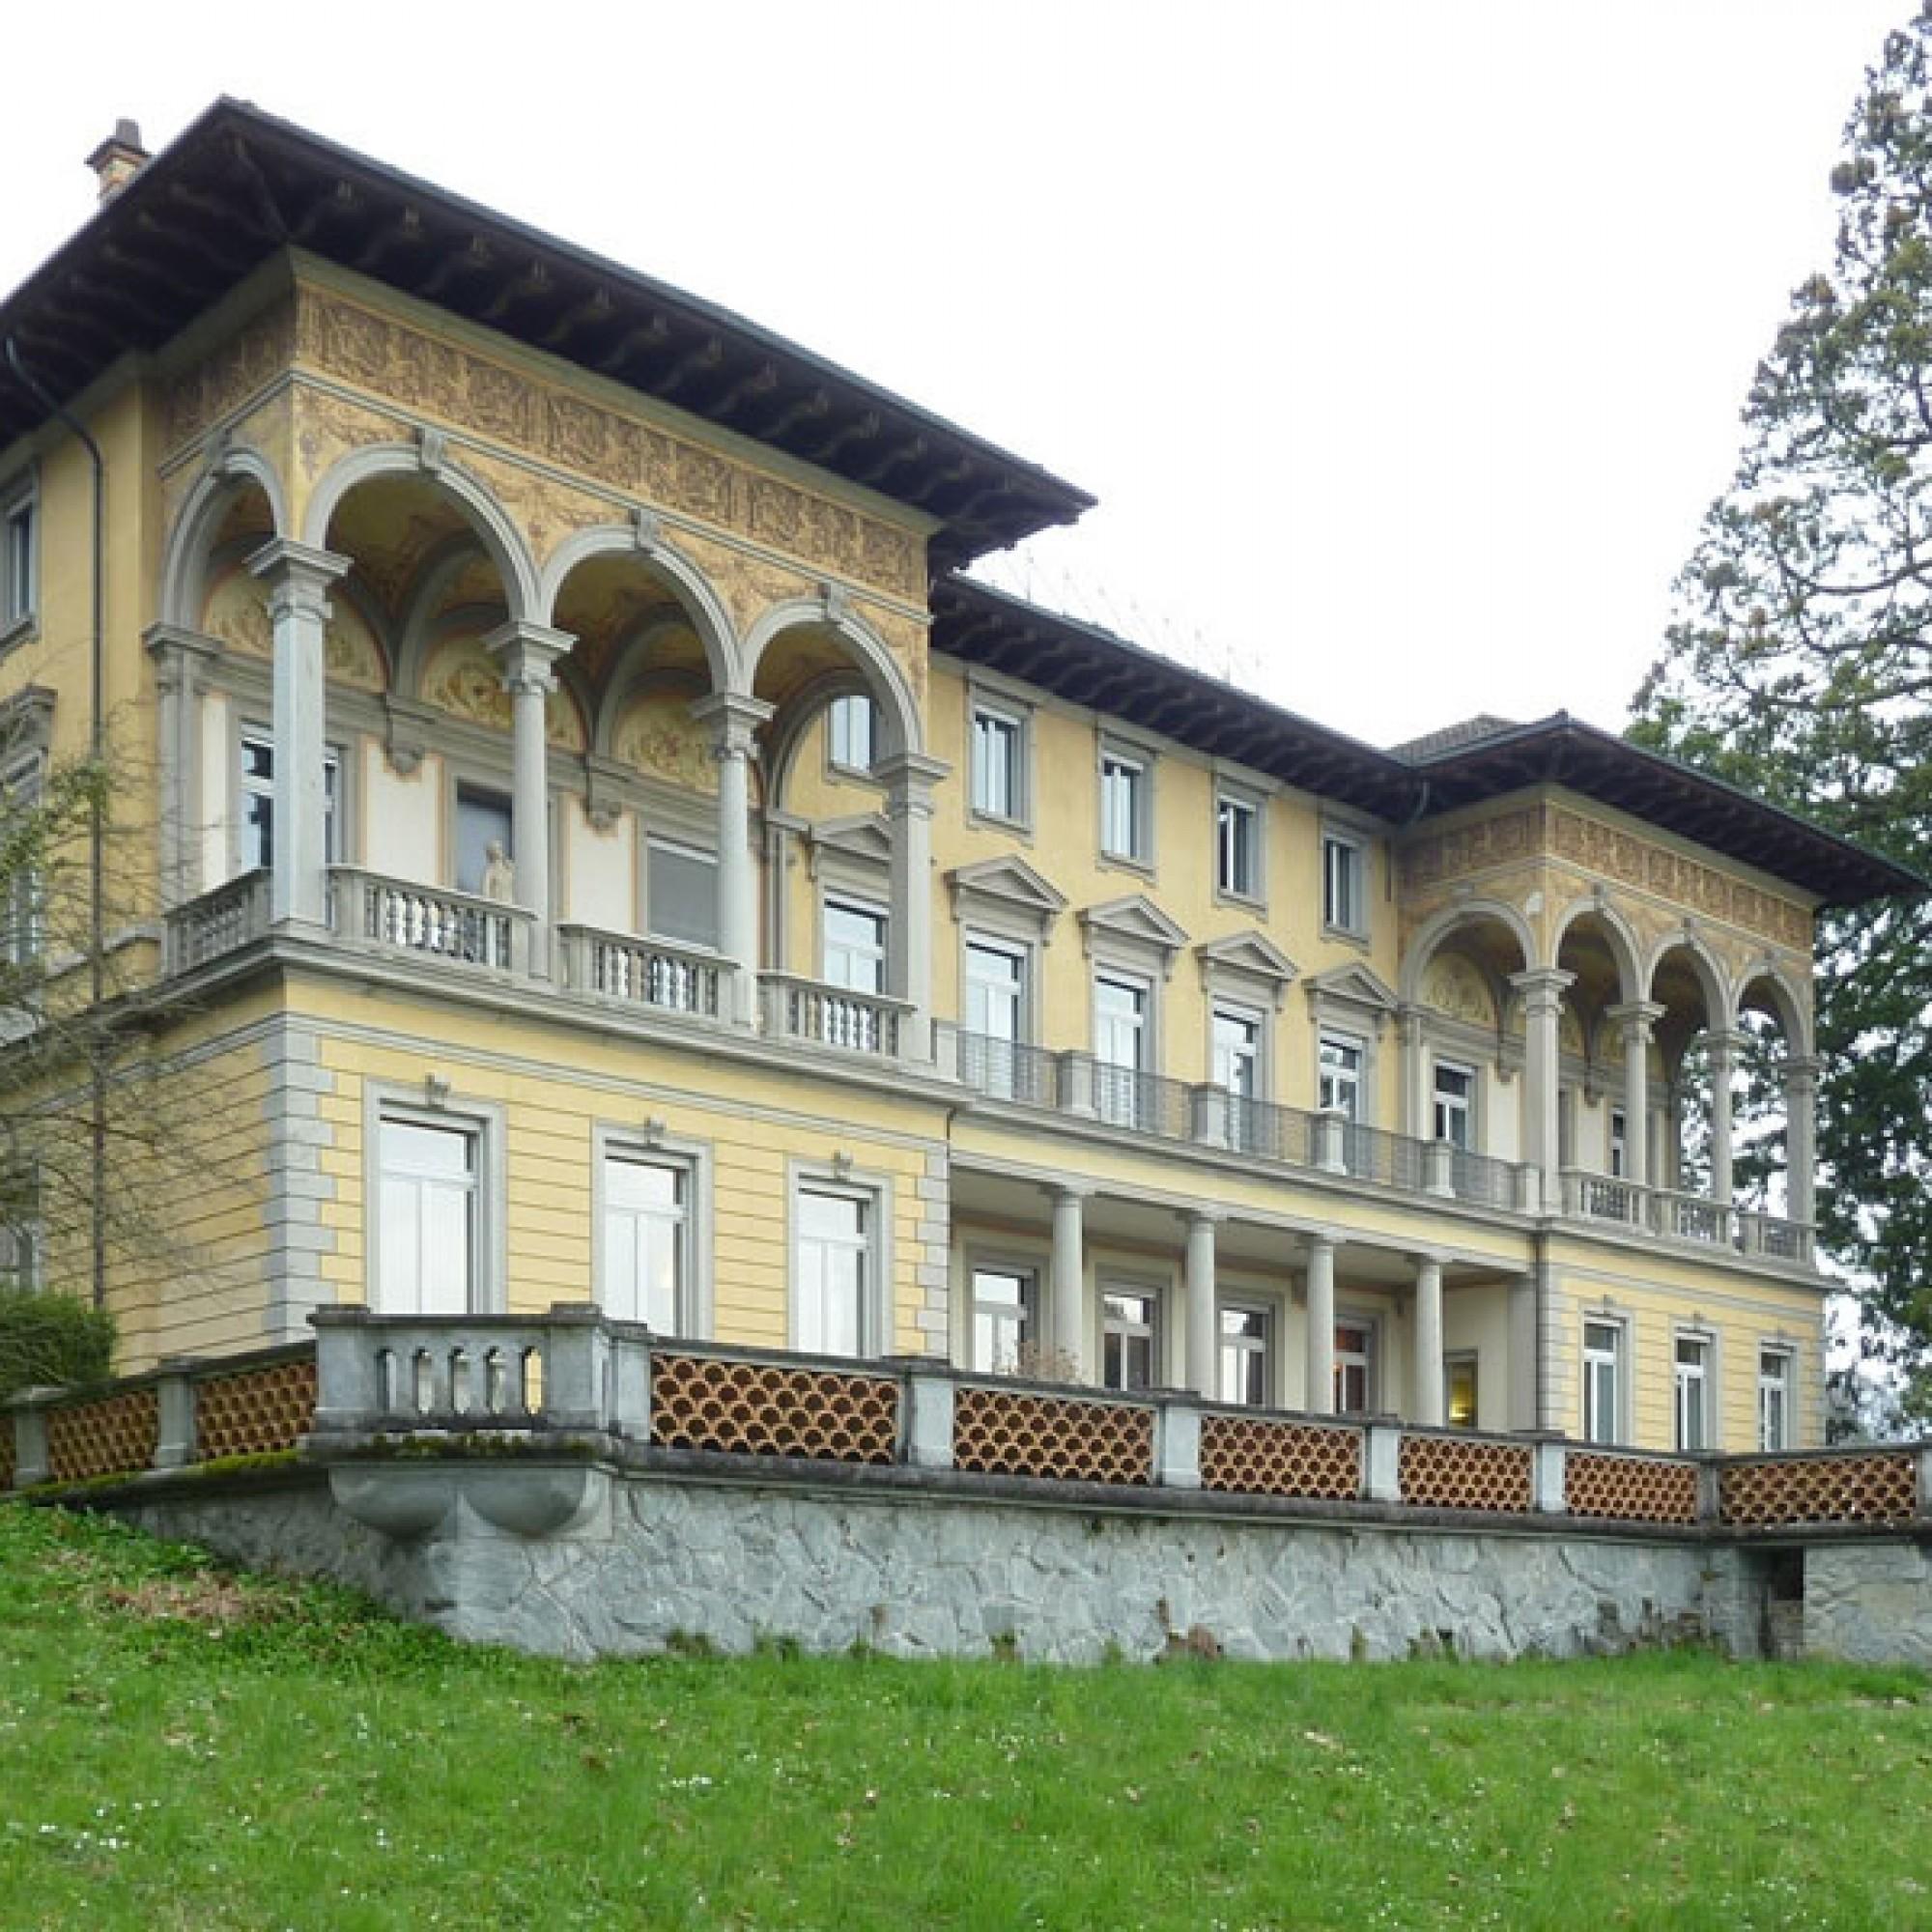 Villa Bellerive: Prachtvolle Fabrikantenvilla in Luzern. (Bild: © Kantonale Denkmalpflege Luzern)